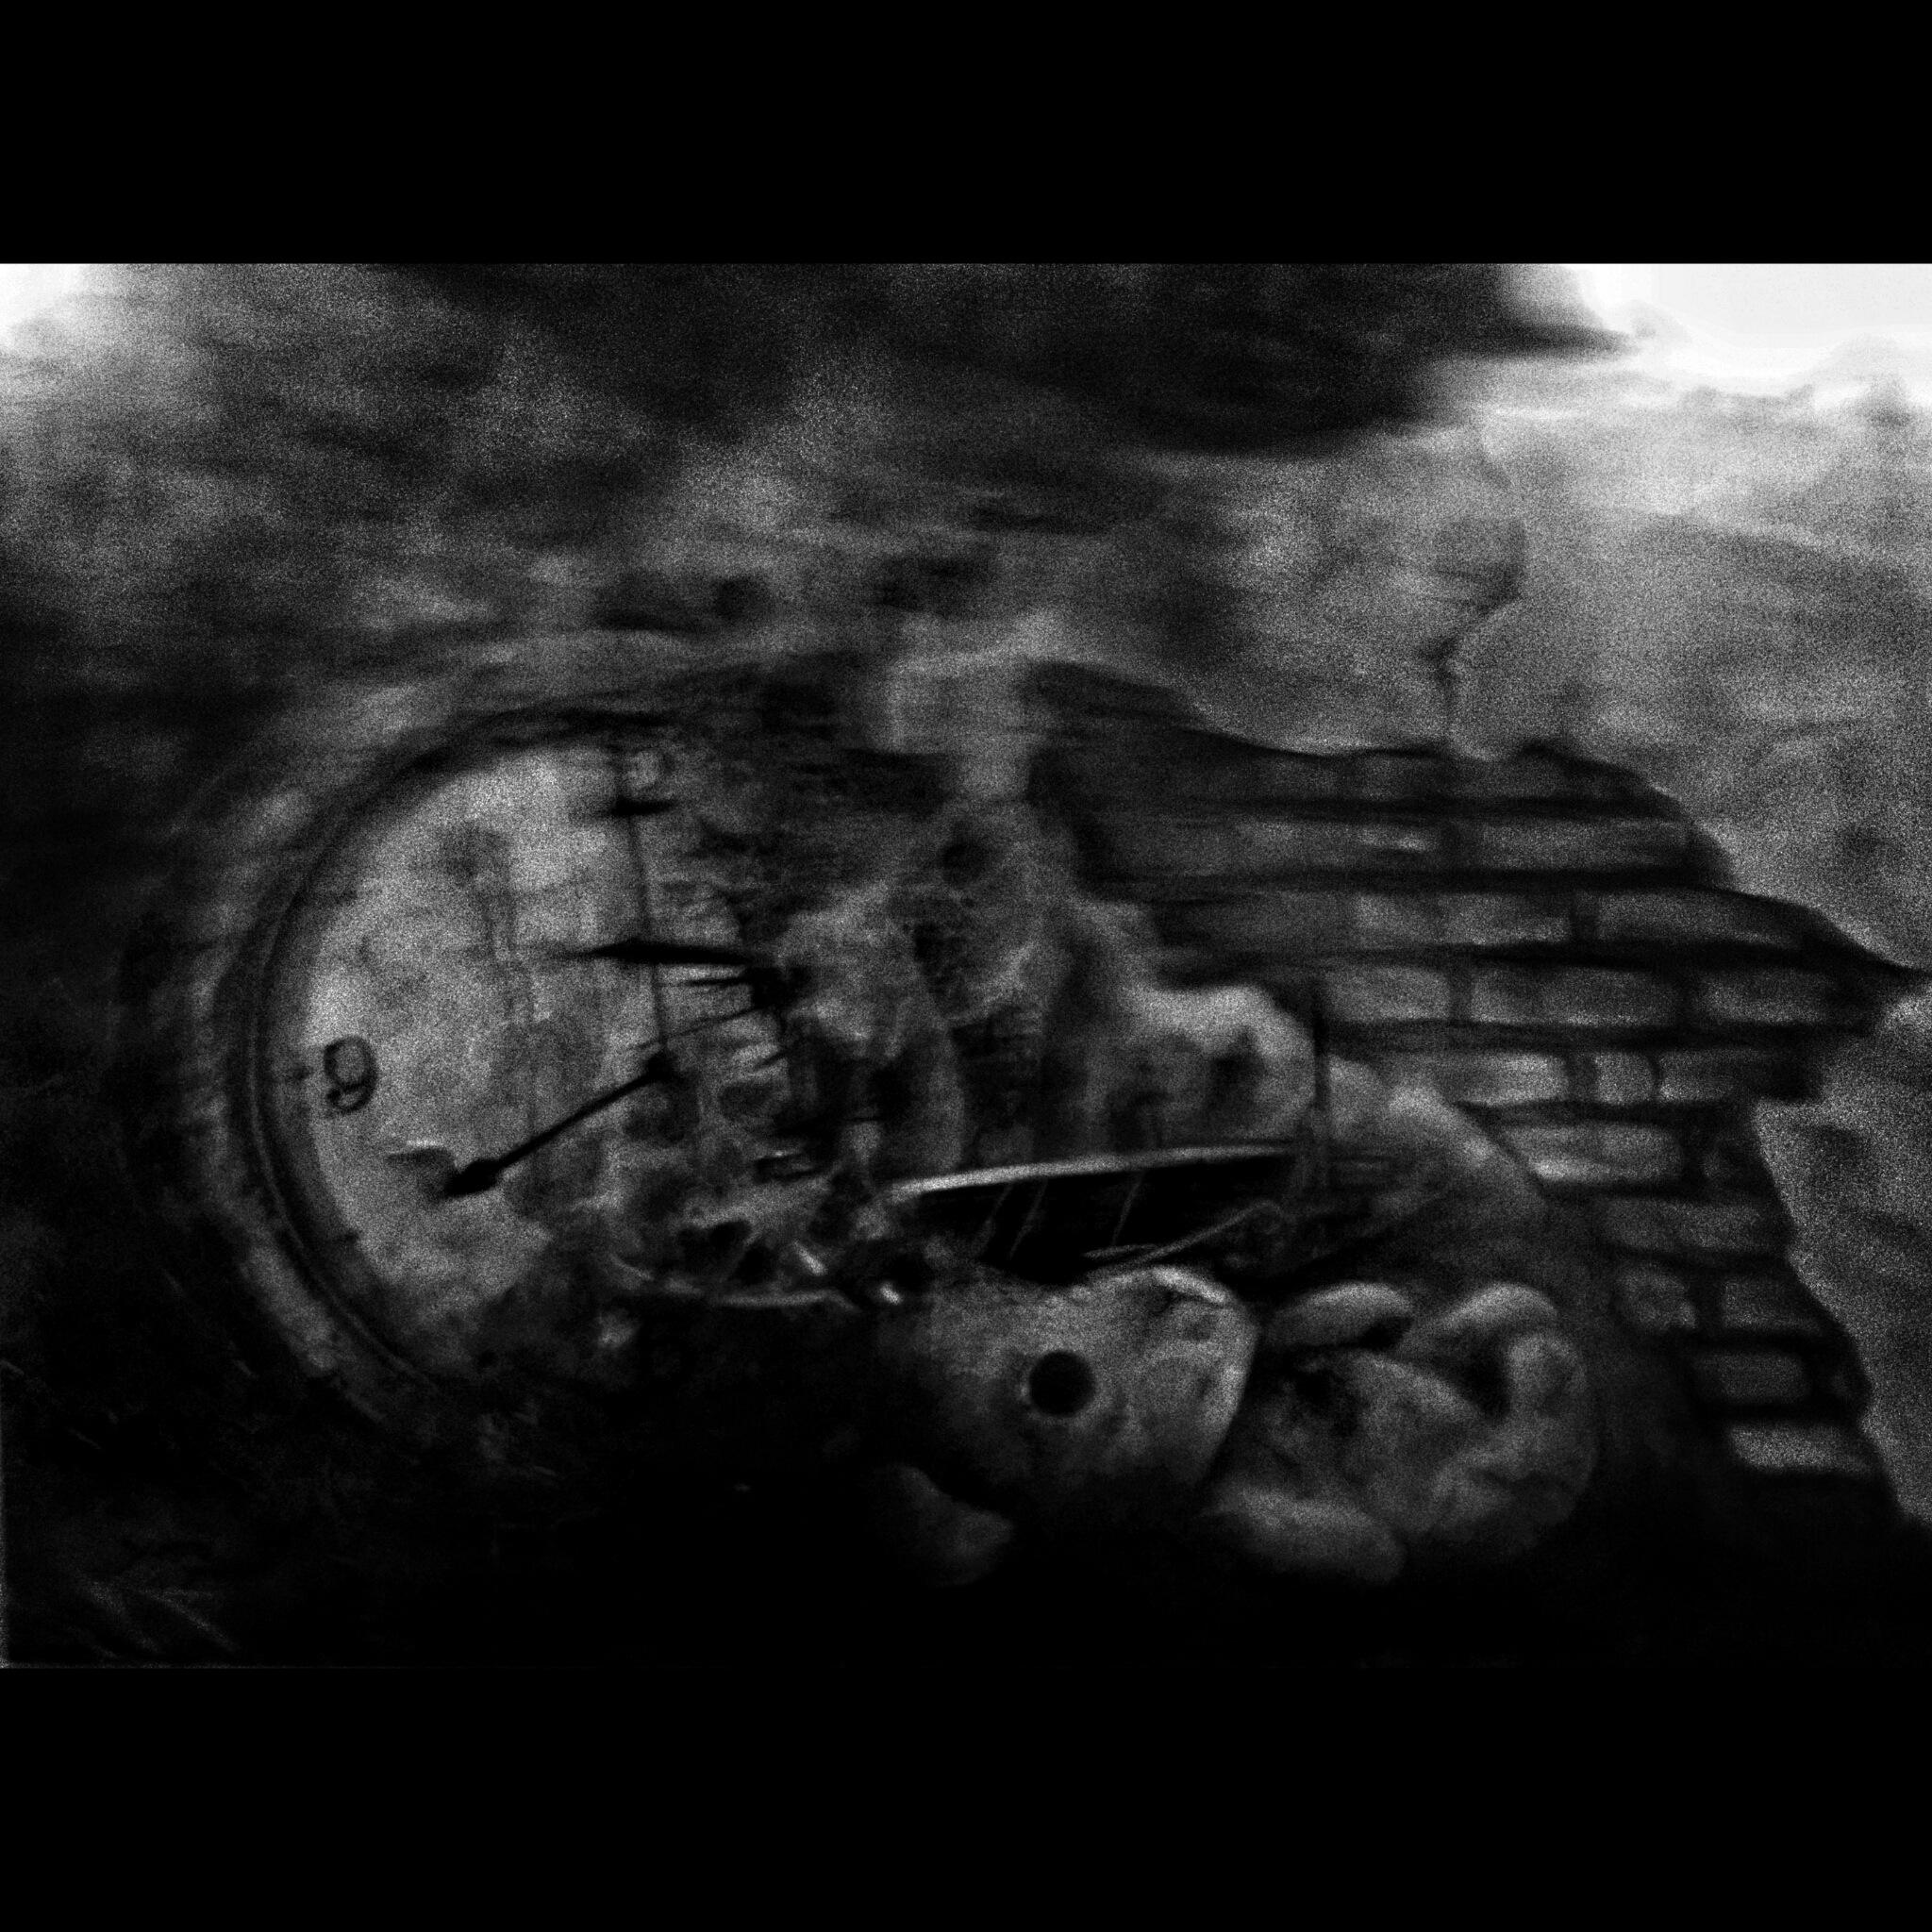 Time Hours Dark by M.Dhanil Maulana